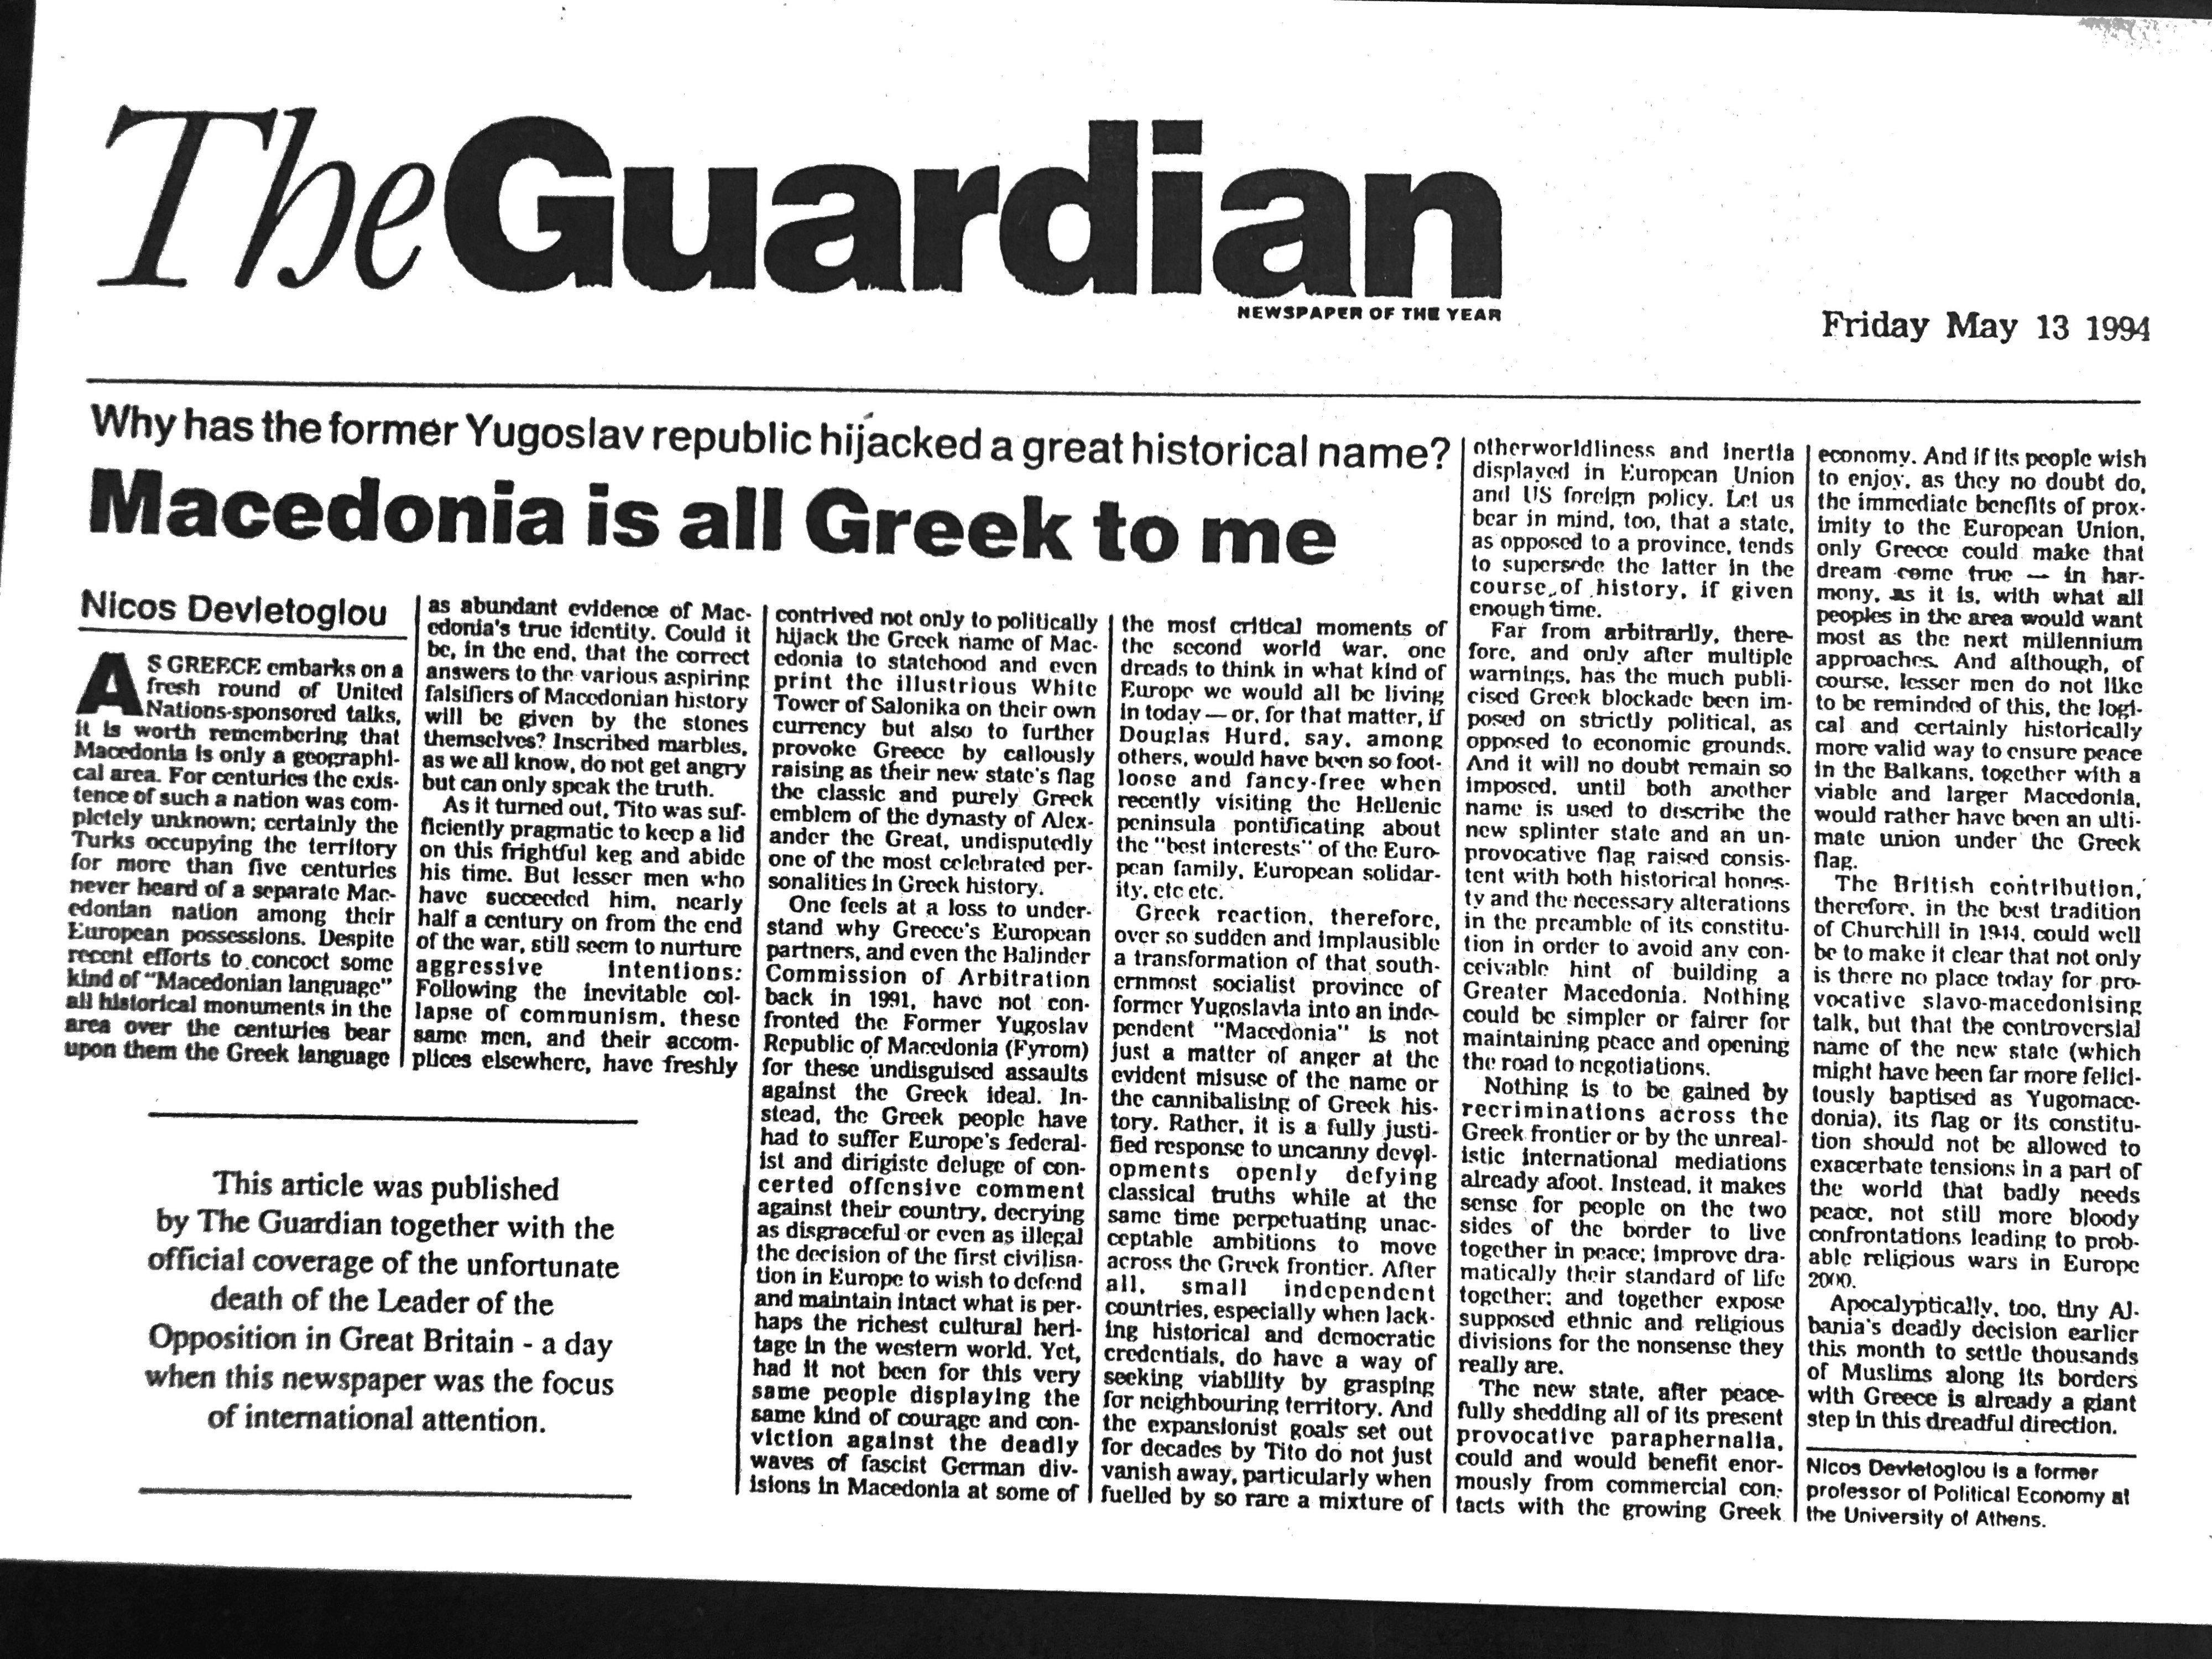 Macedonia is all Greek to me (Η Μακεδονία είναι Ελληνική για